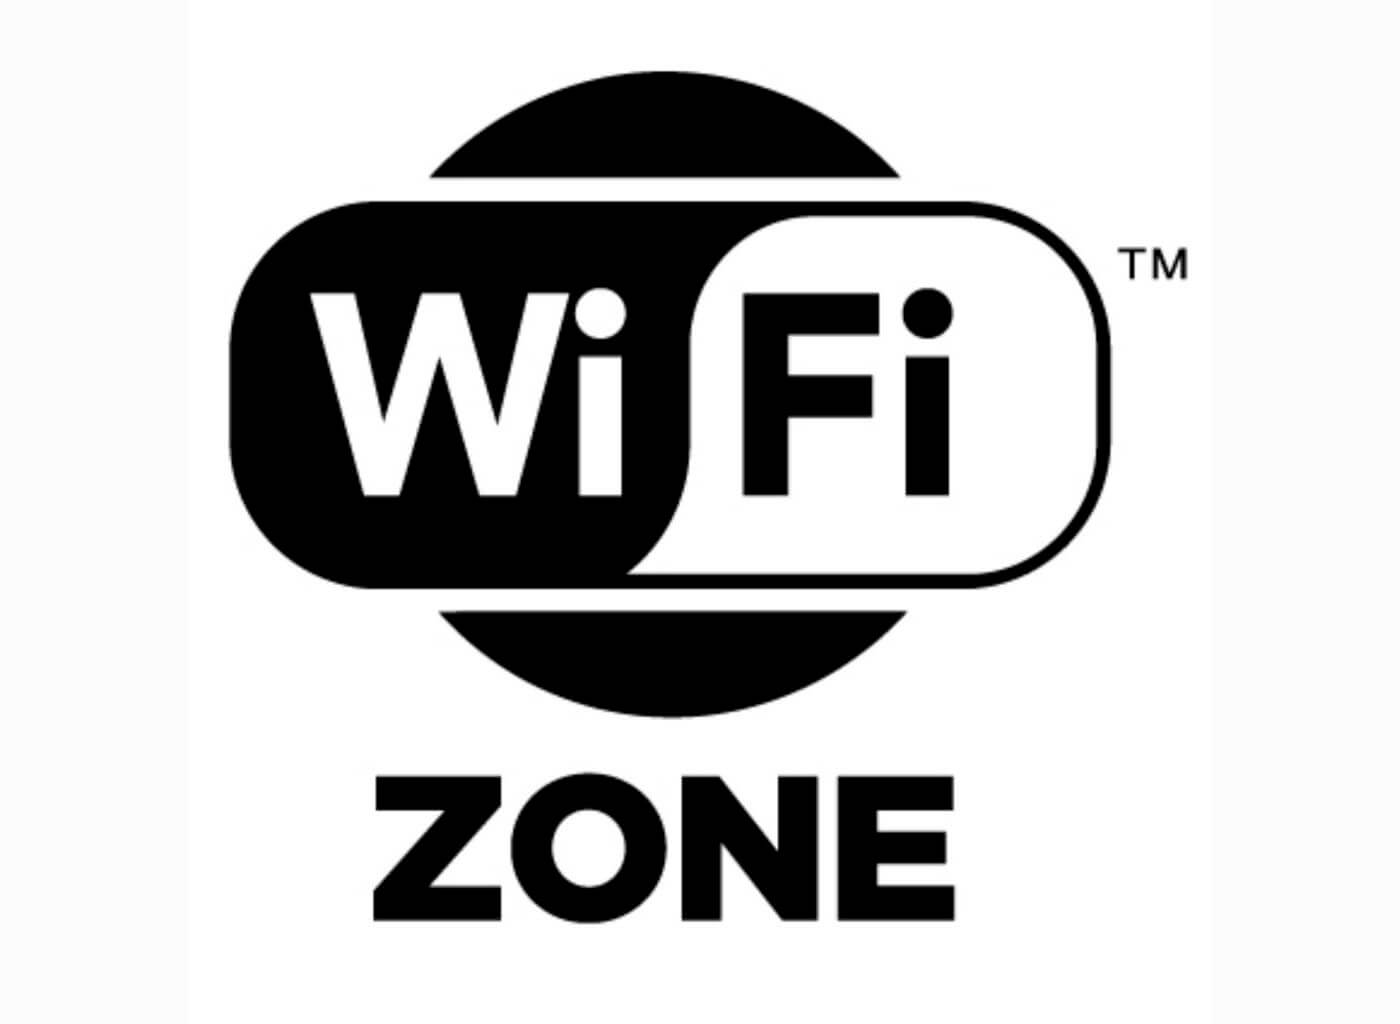 На Ко Липе есть Wi-Fi